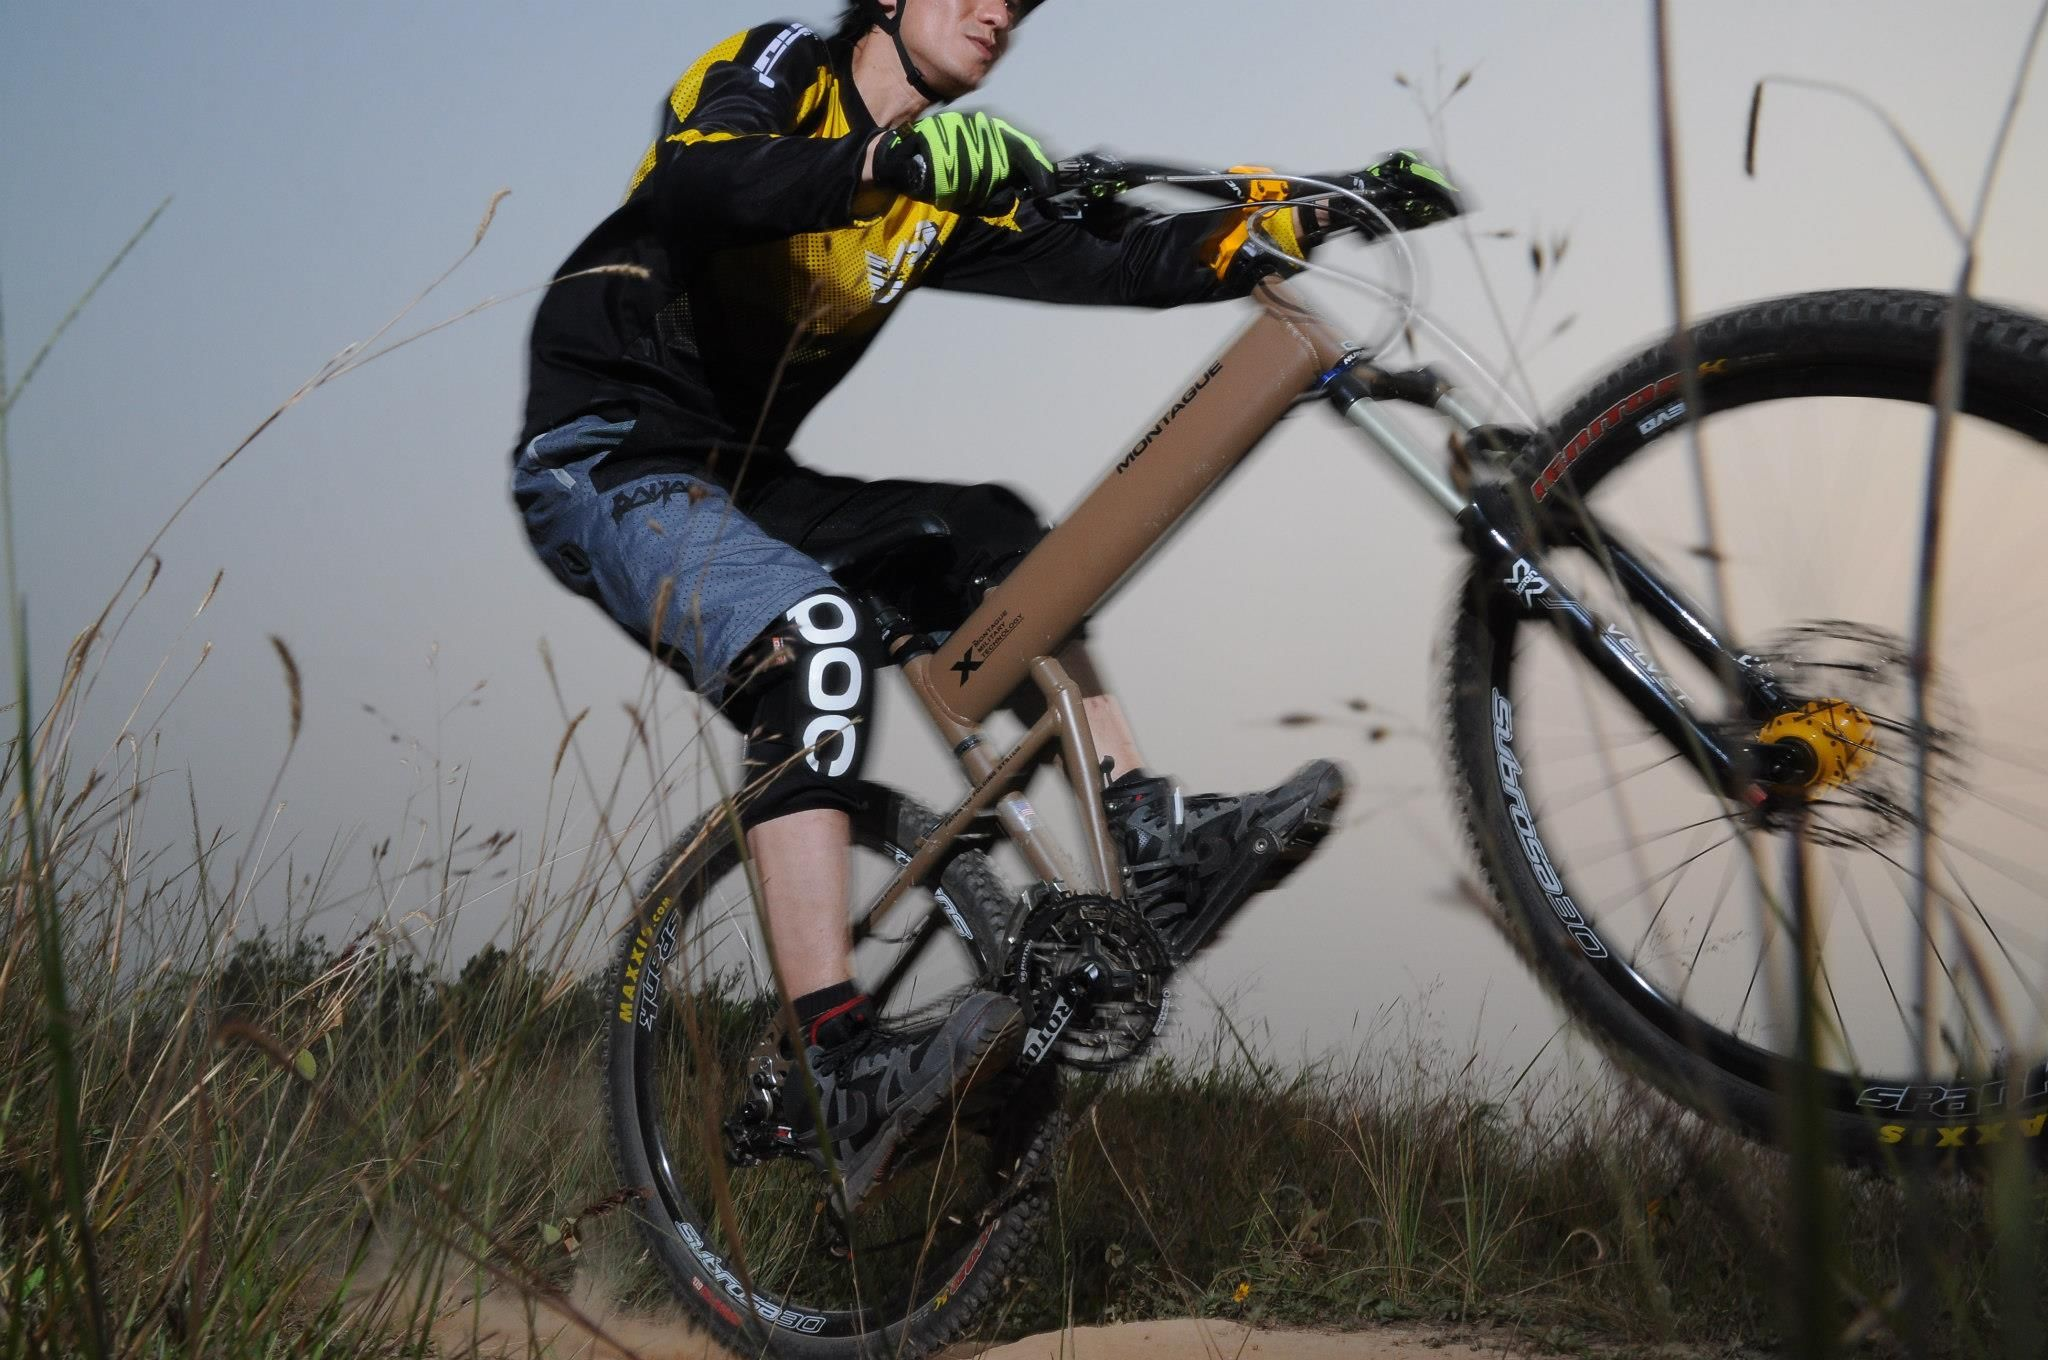 hummer road bike - Google Search | Bike design, Montague